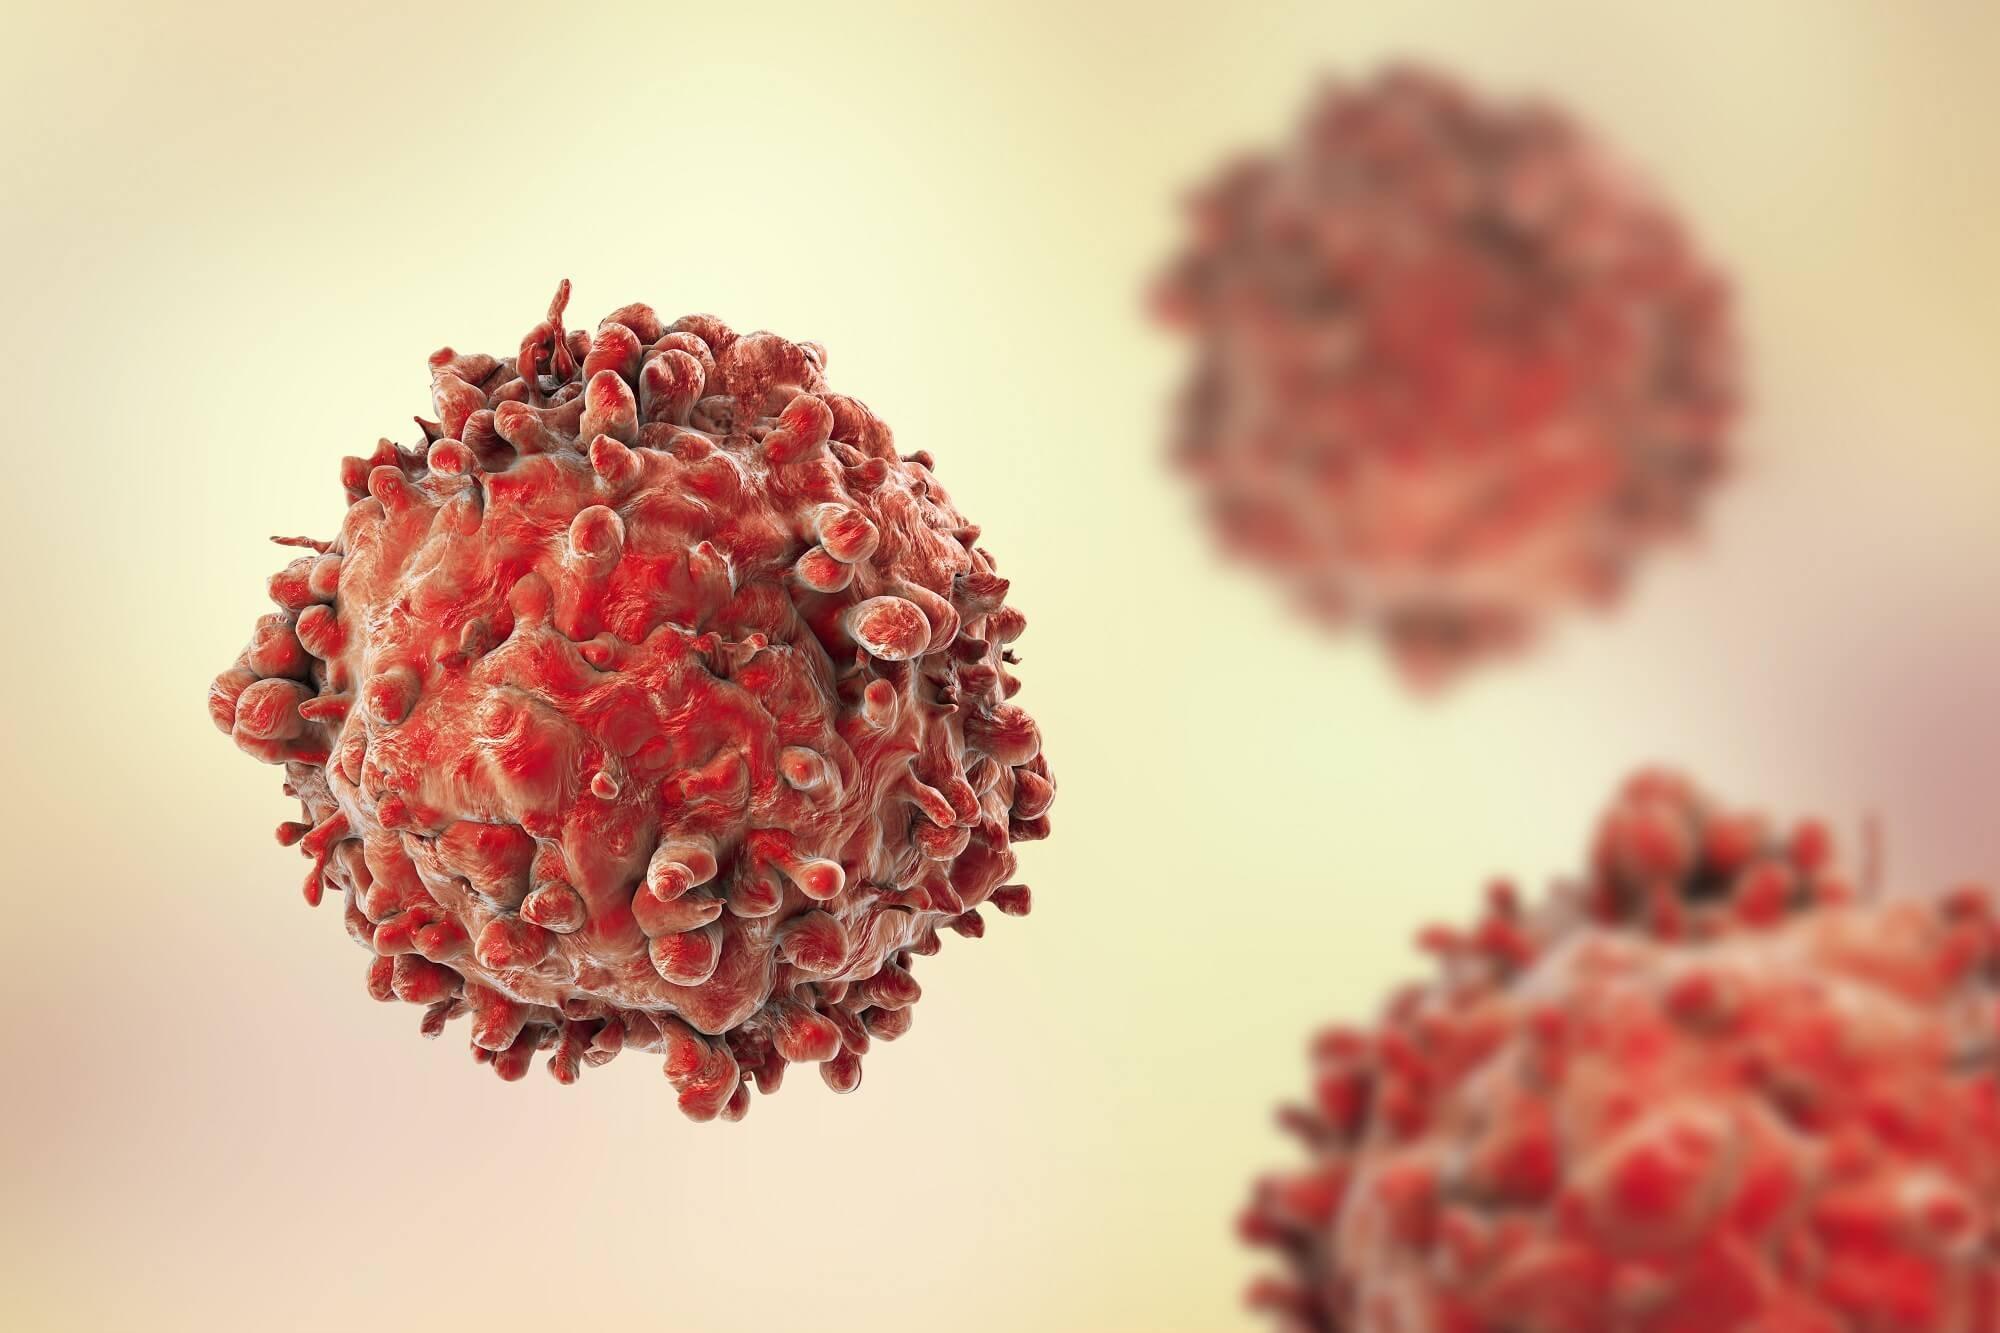 Ponatinib as a Treatment for Philadelphia Chromosome-Positive Acute Lymphoblastic Leukemia